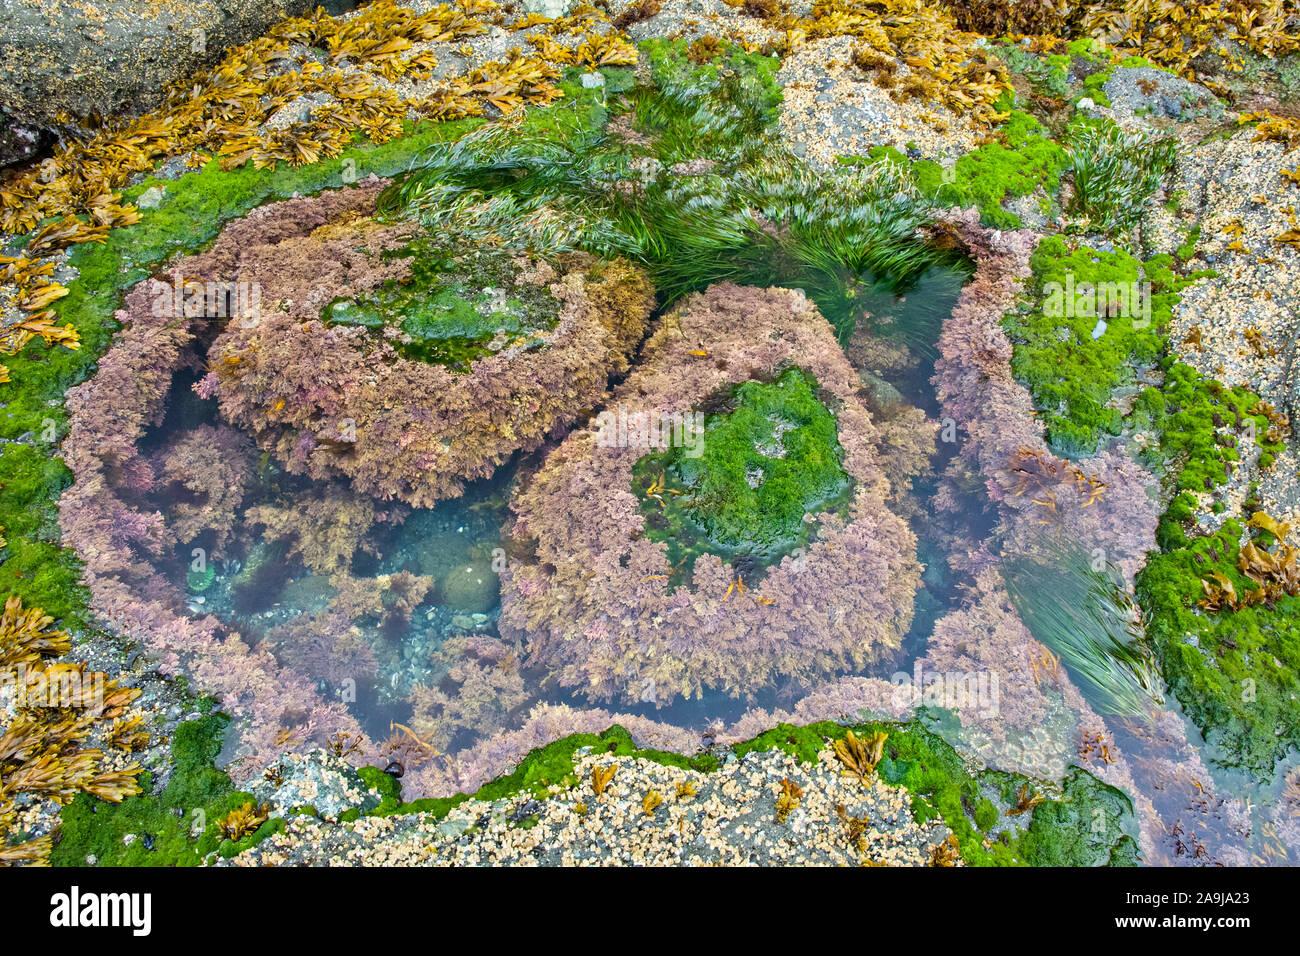 tide pool wih coralline algae, Corallina species, bladder wrack, Fucus vesiculosus, acorn barnacles, Balanus glandula, and Scouler's surfgrass, Phyllo Stock Photo